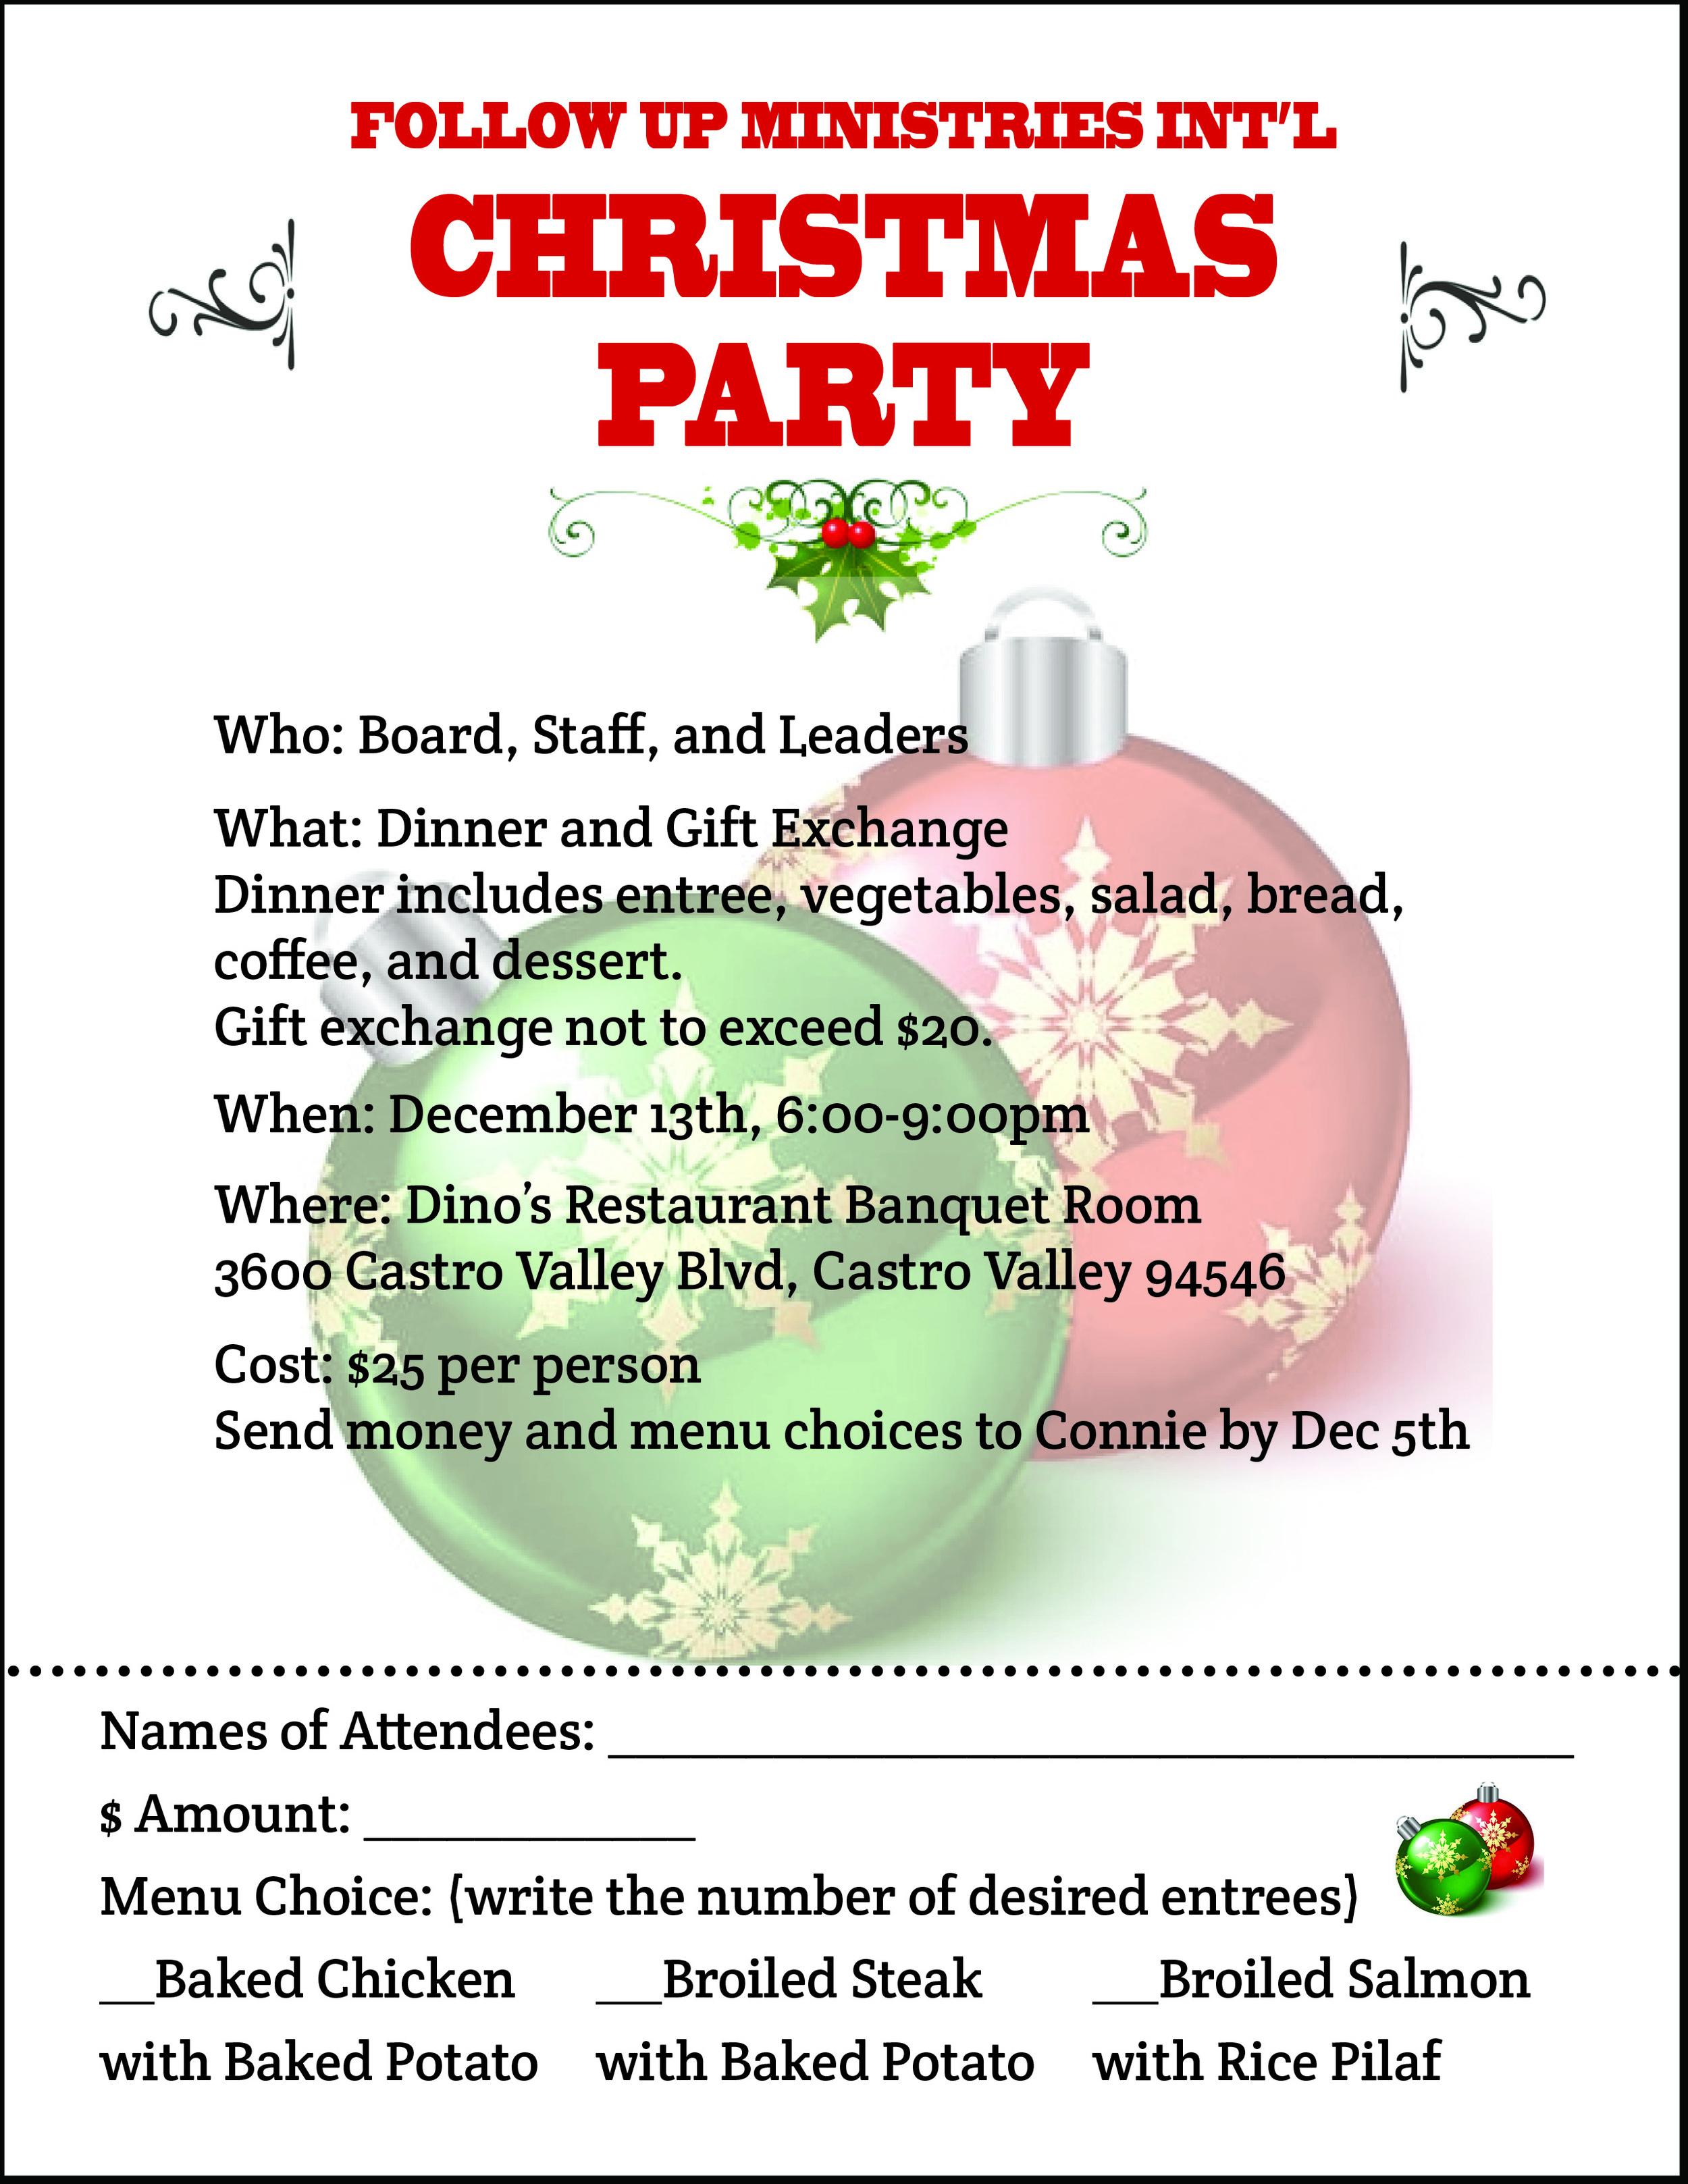 FUMI Christmas Dinner Invite 2.jpg